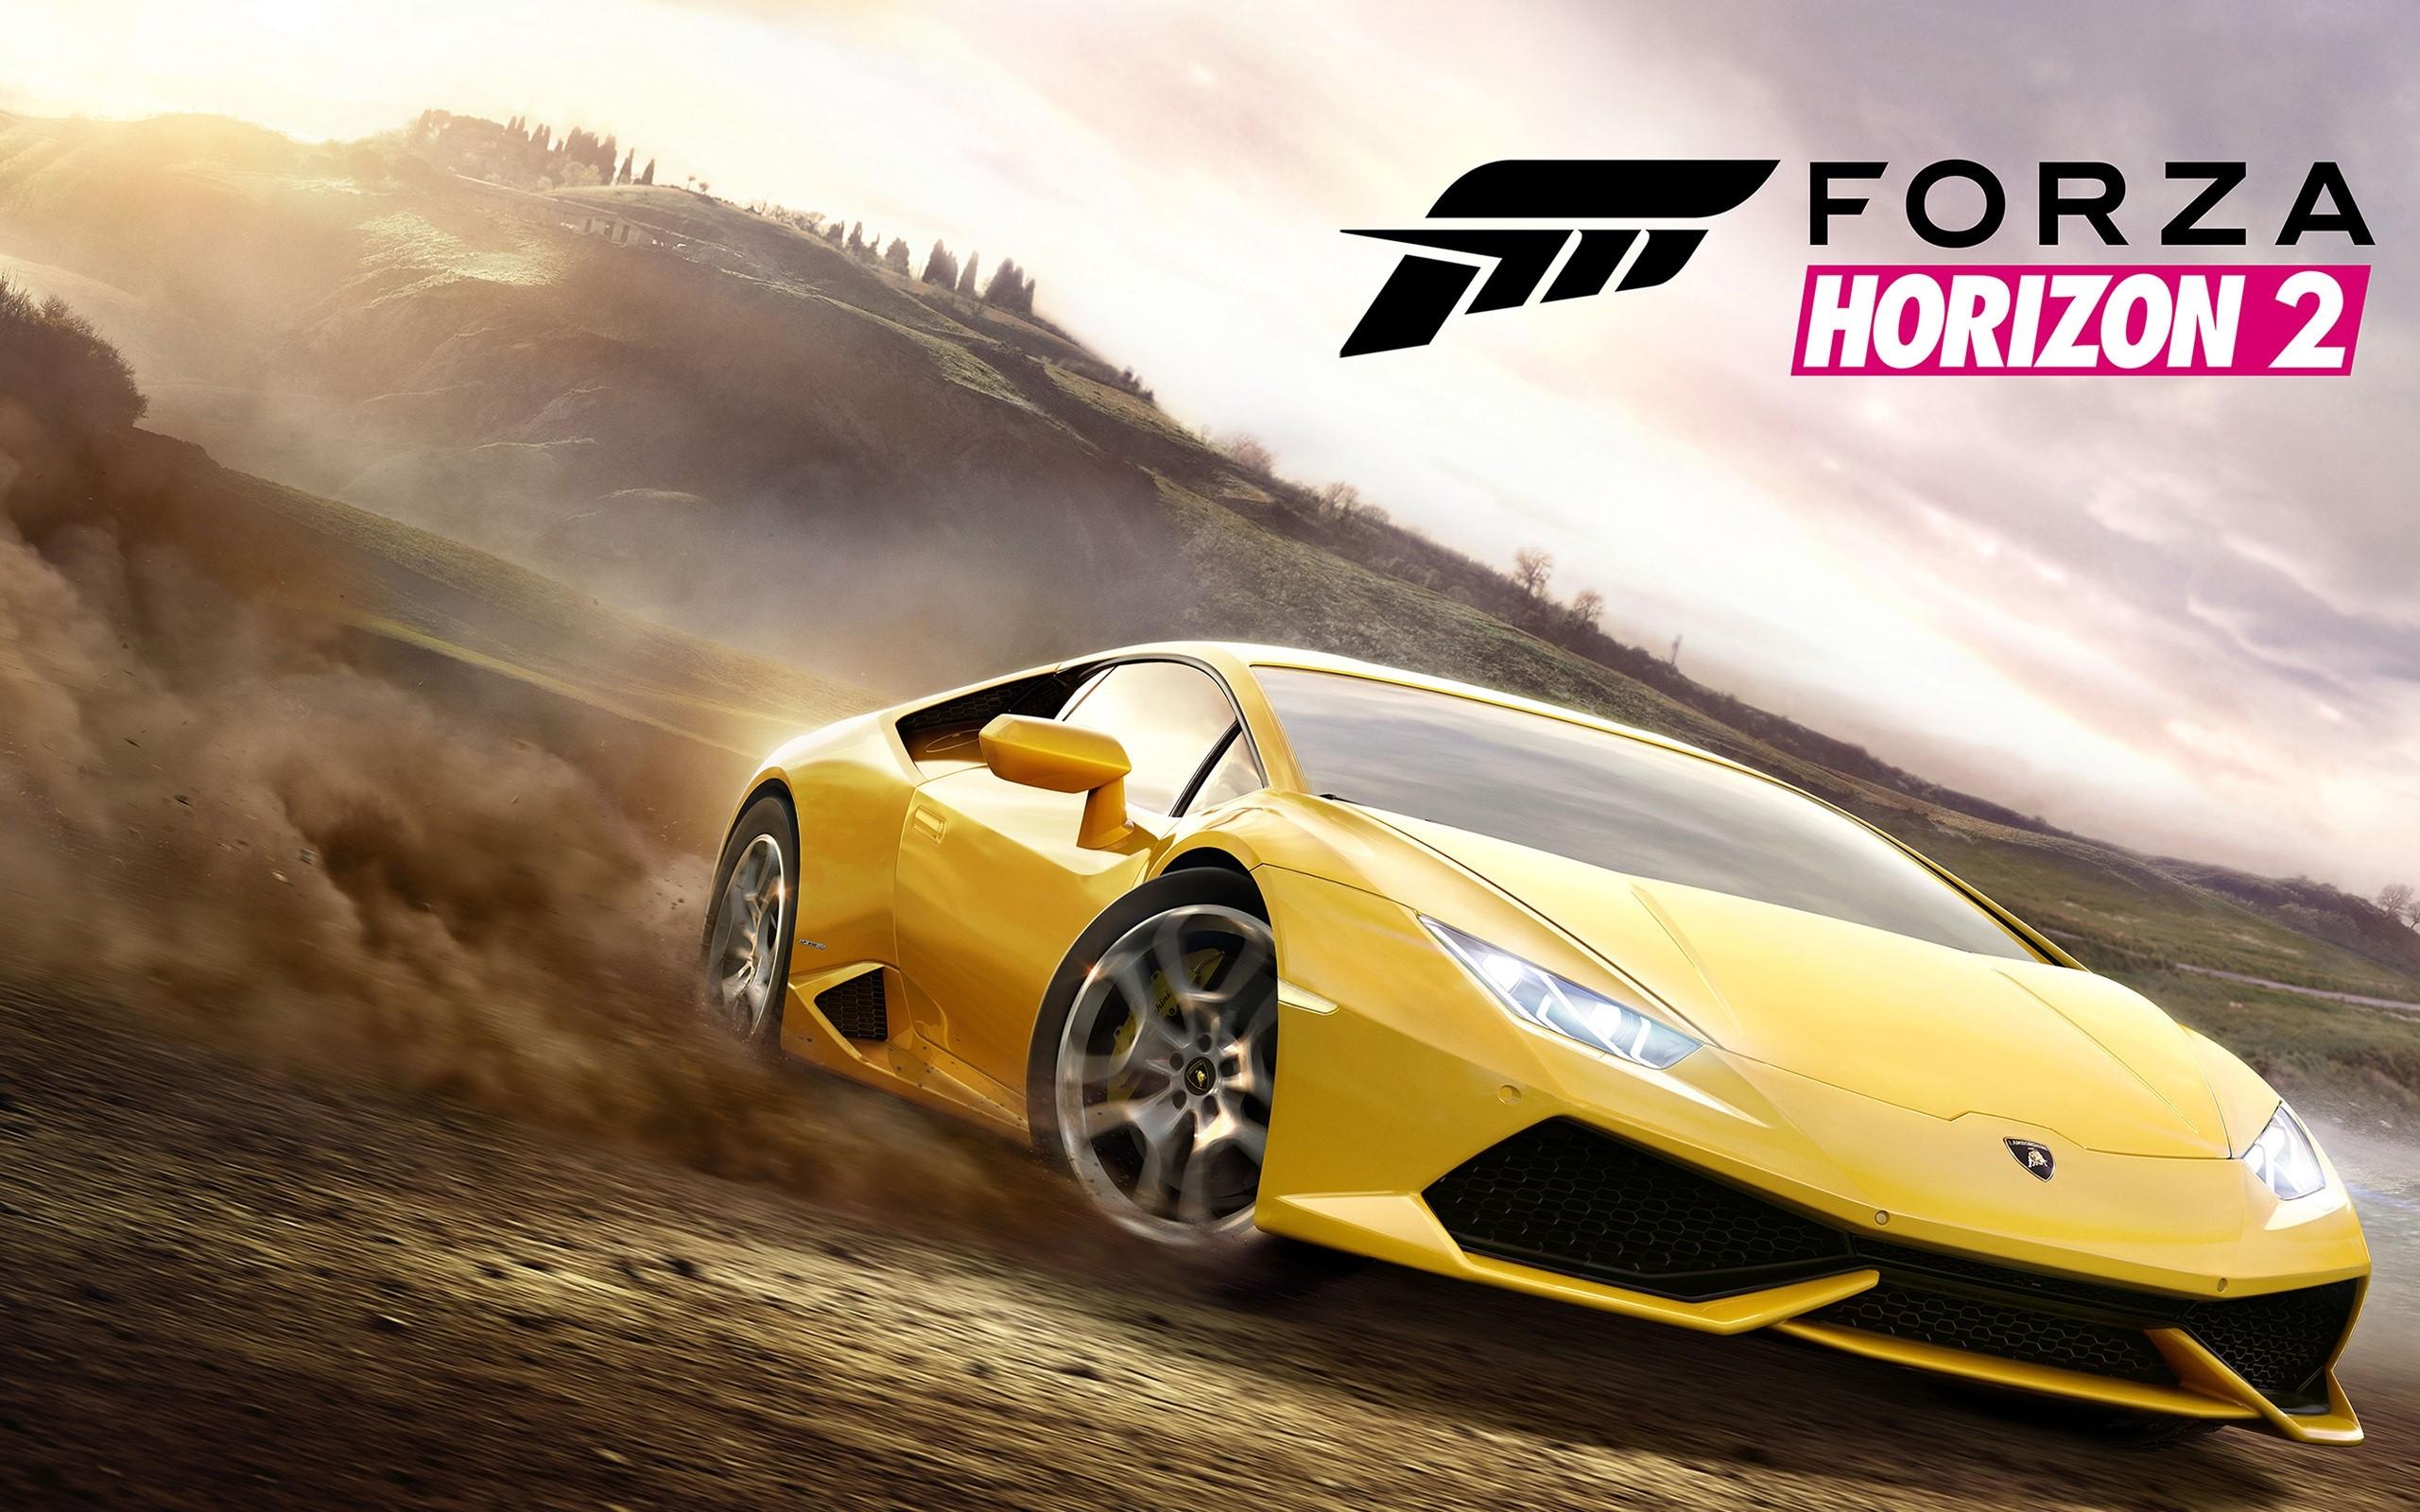 Wallpaper Forza horizon 2